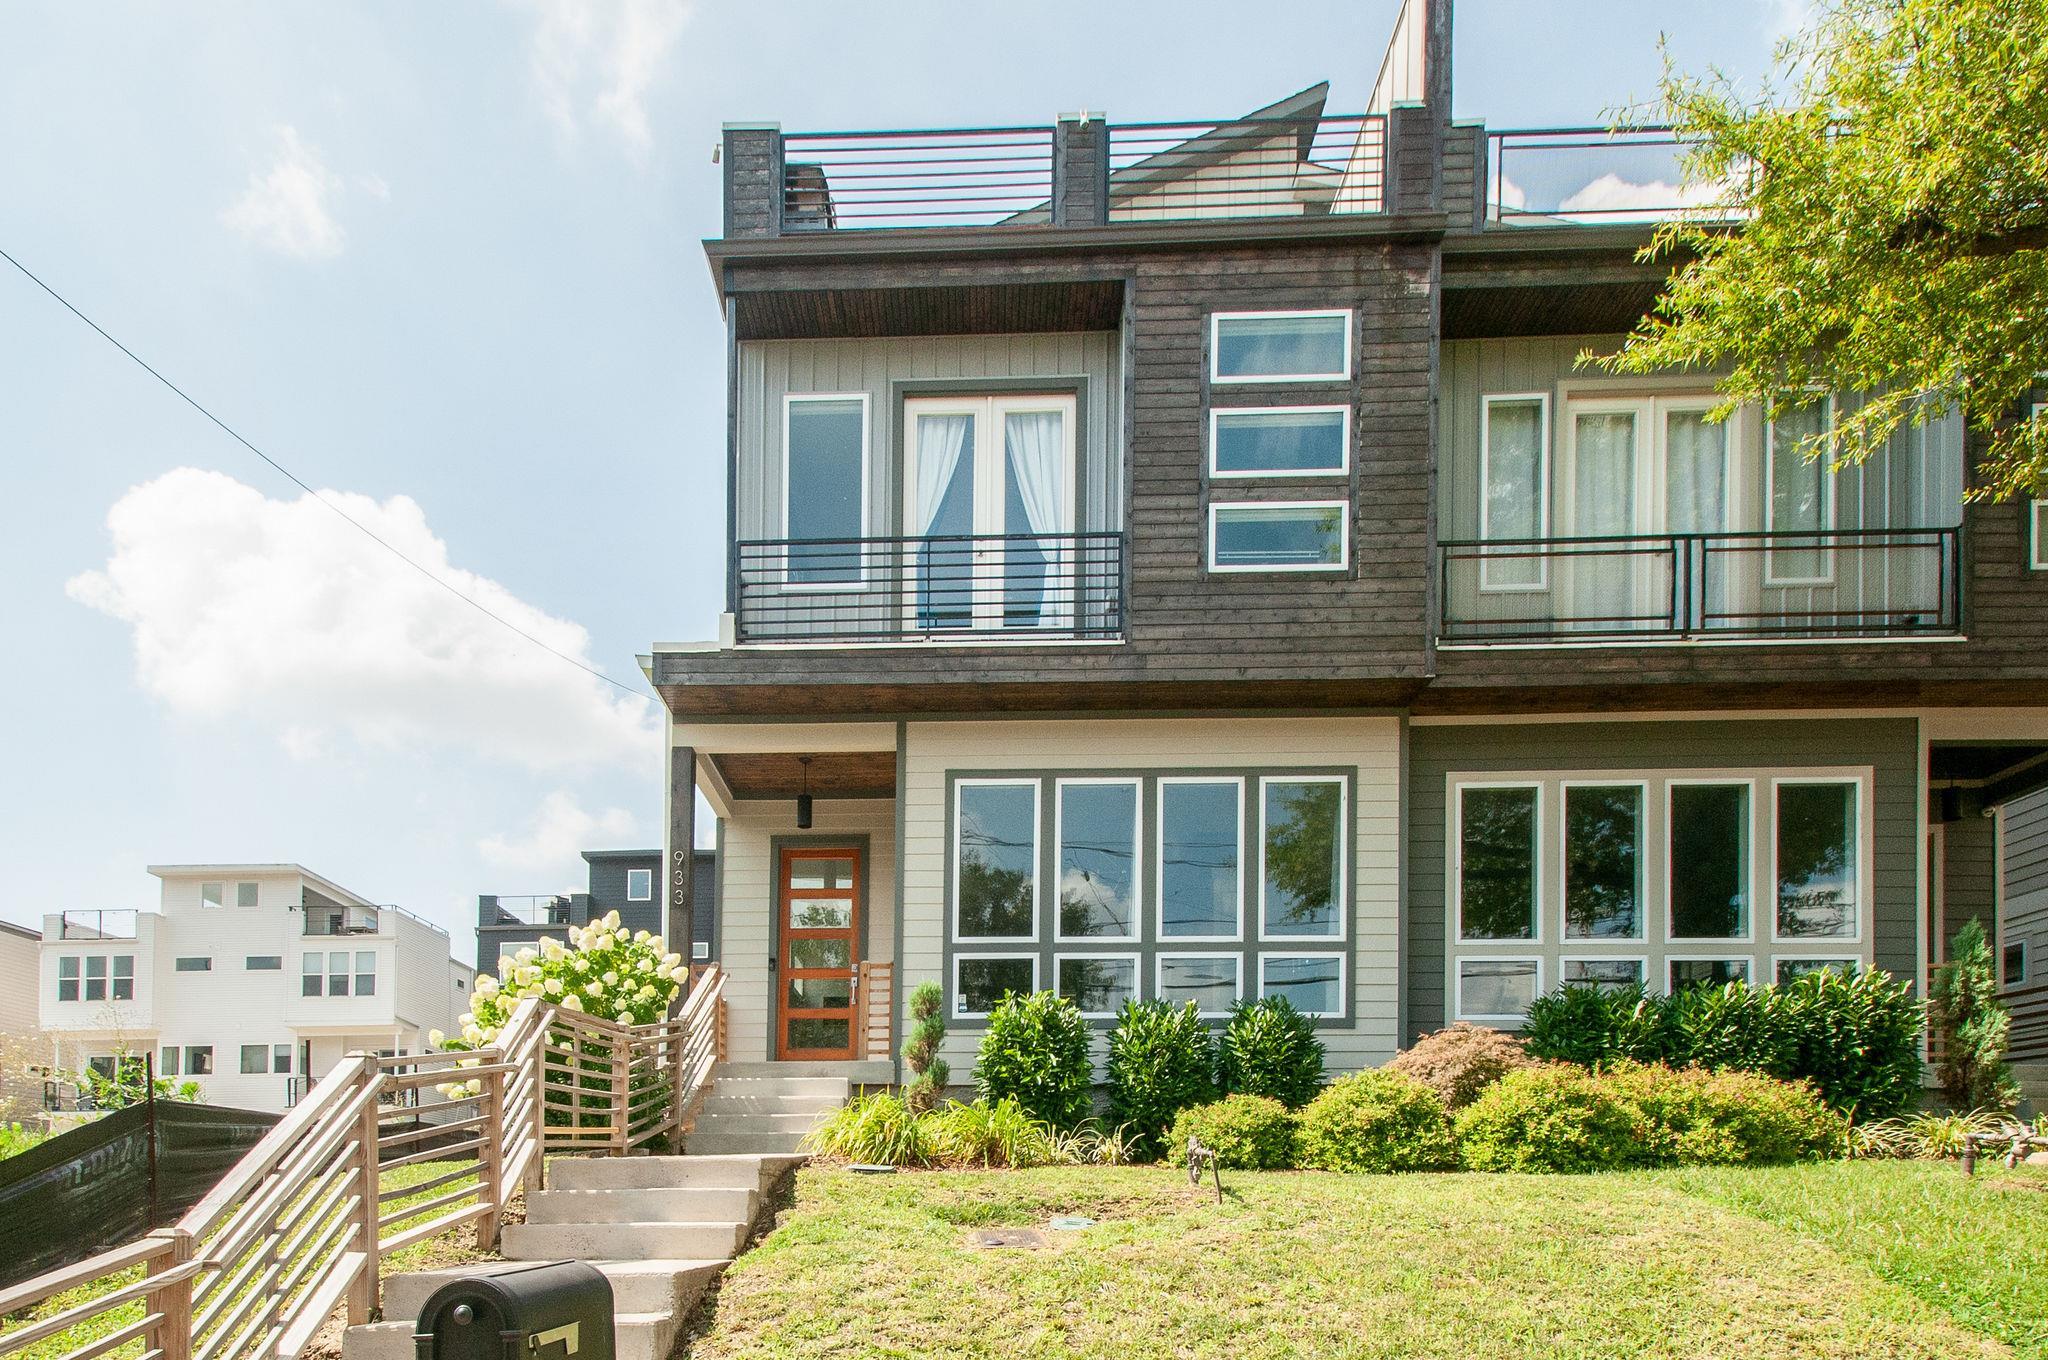 933 South St, Nashville, TN 37203 - Nashville, TN real estate listing